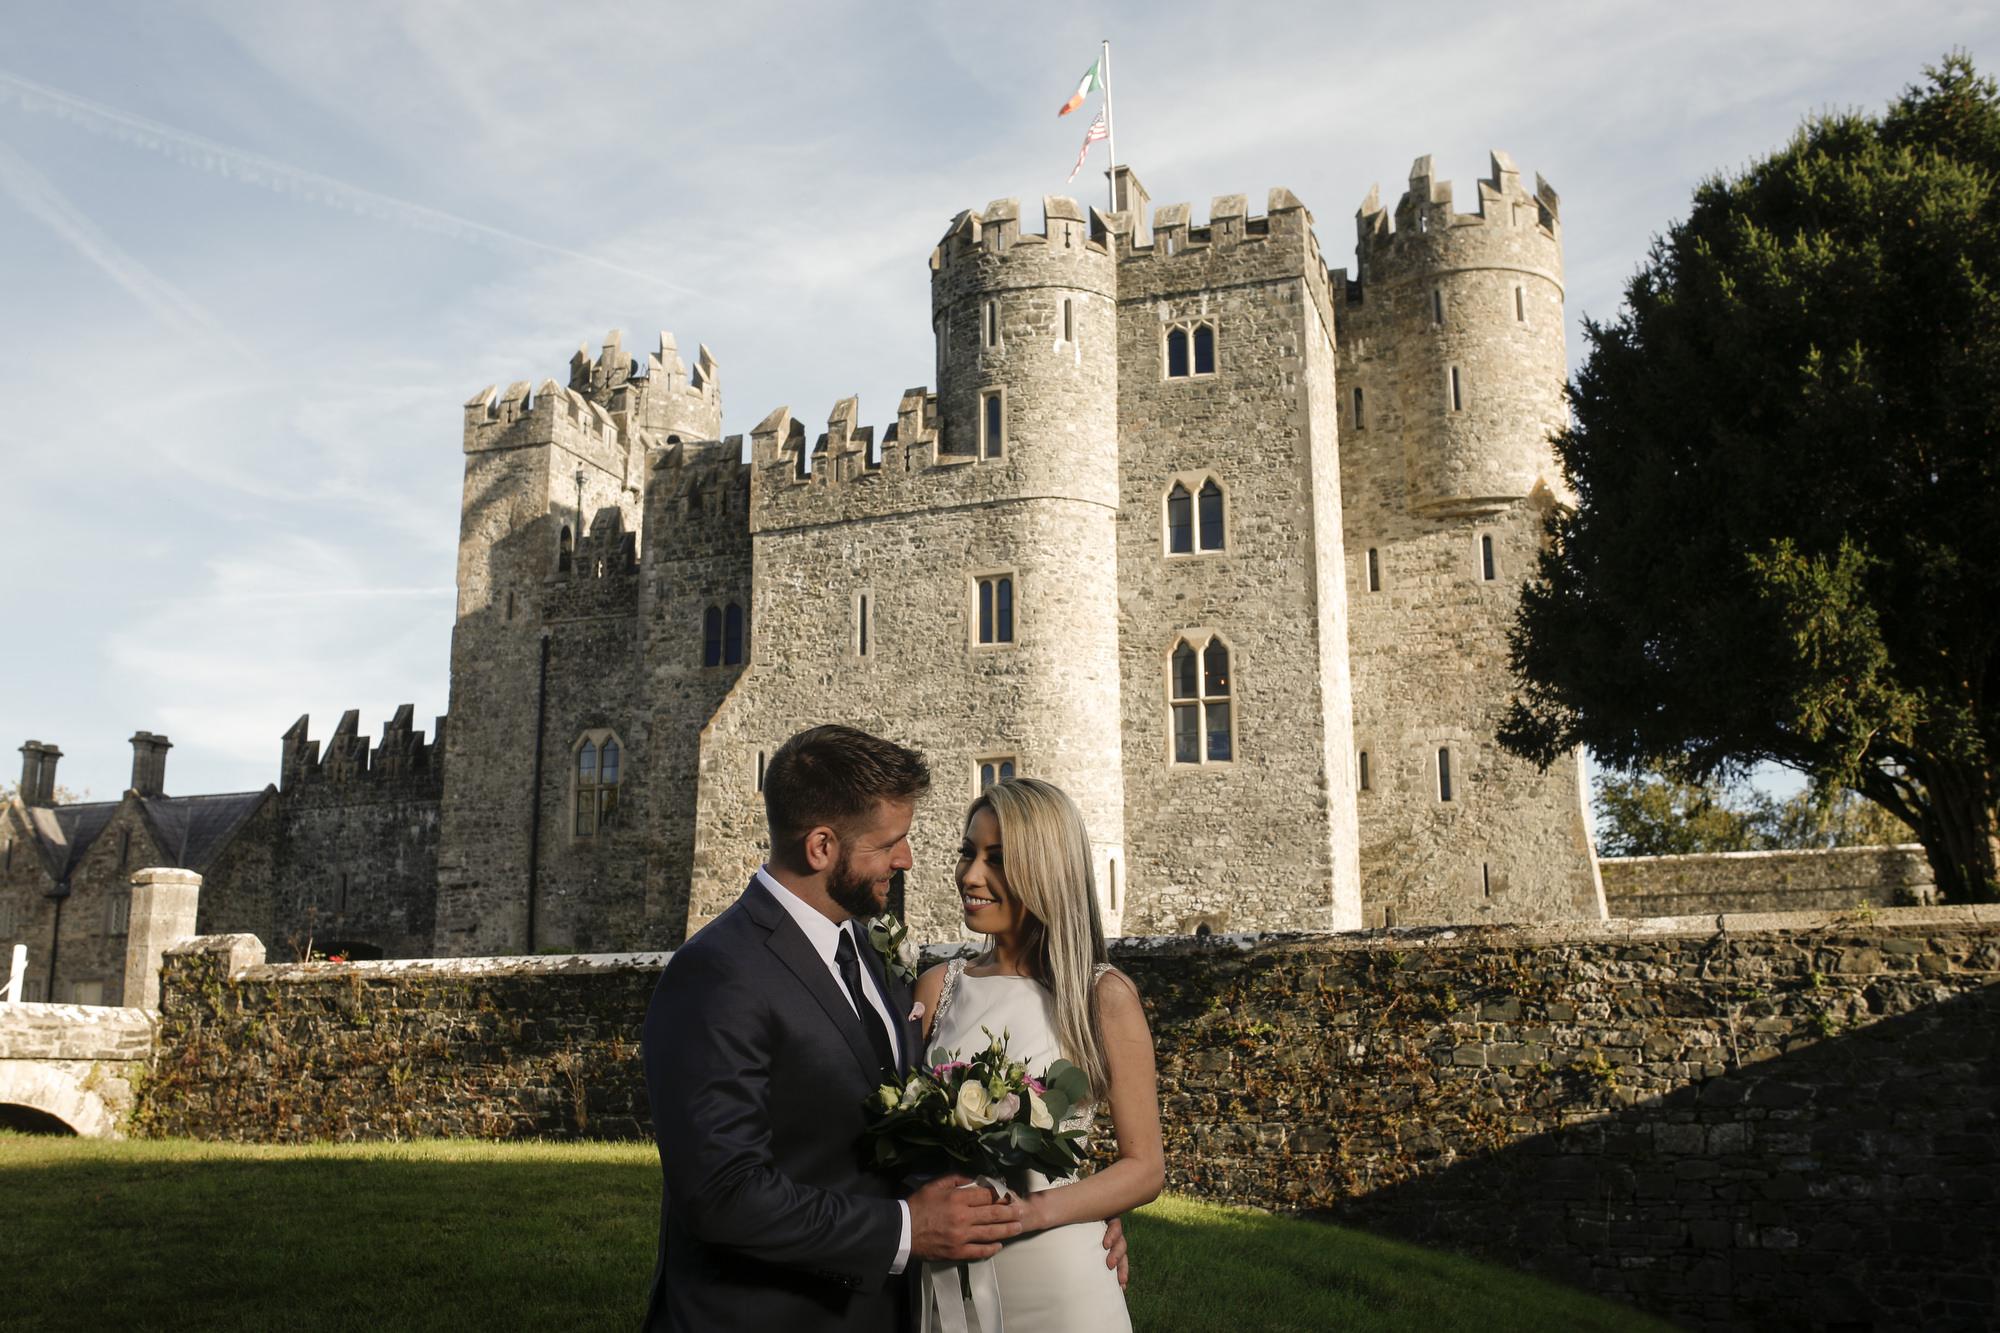 kilkea_castle_wedding_photographer_goldenmoments_036.jpg